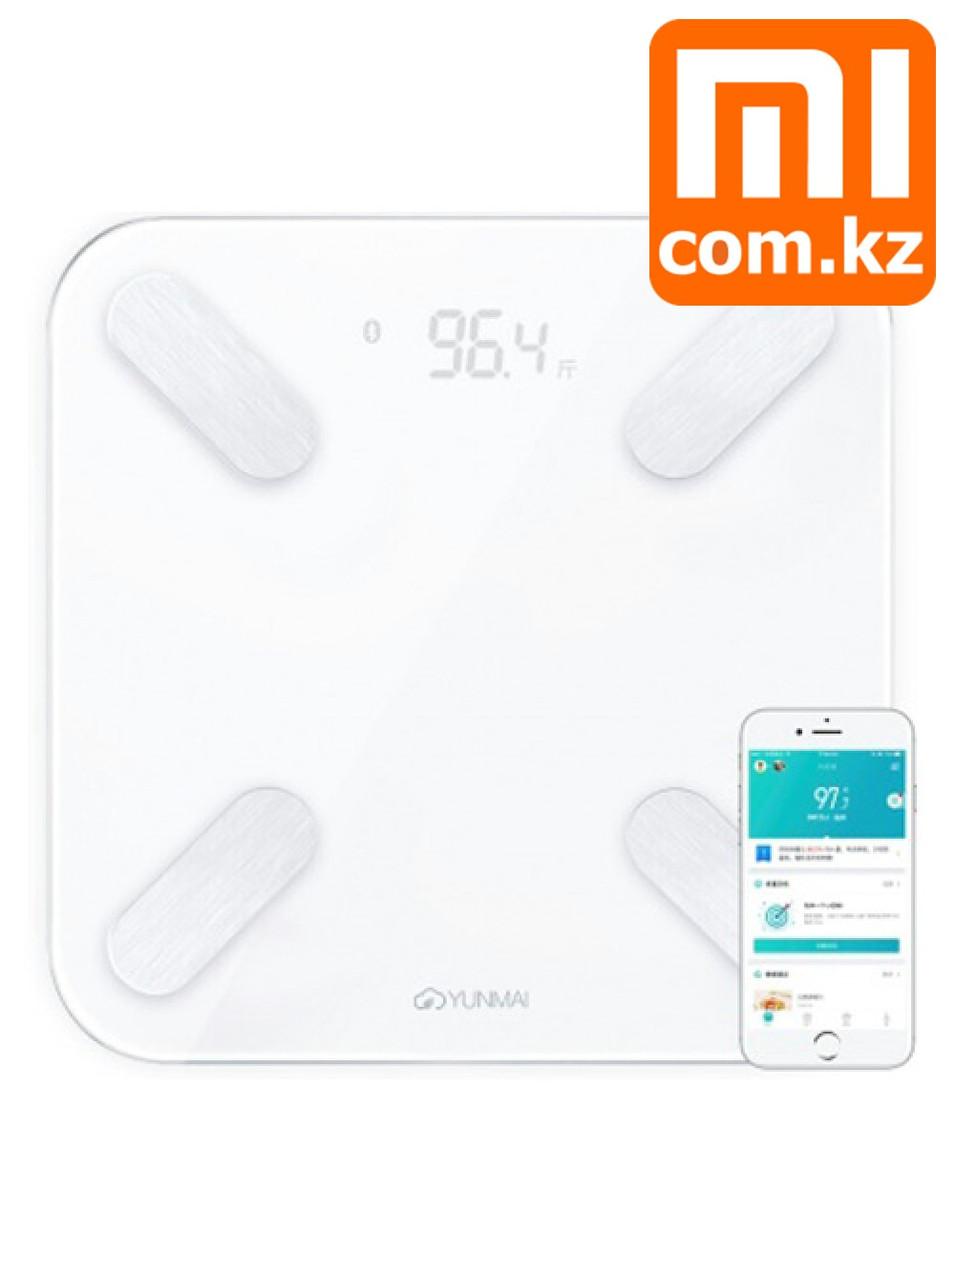 Весы для тела Xiaomi Mi Yunmai Mini Smart Scale 2T, с подключением к смартфону. Оригинал. Арт.6376